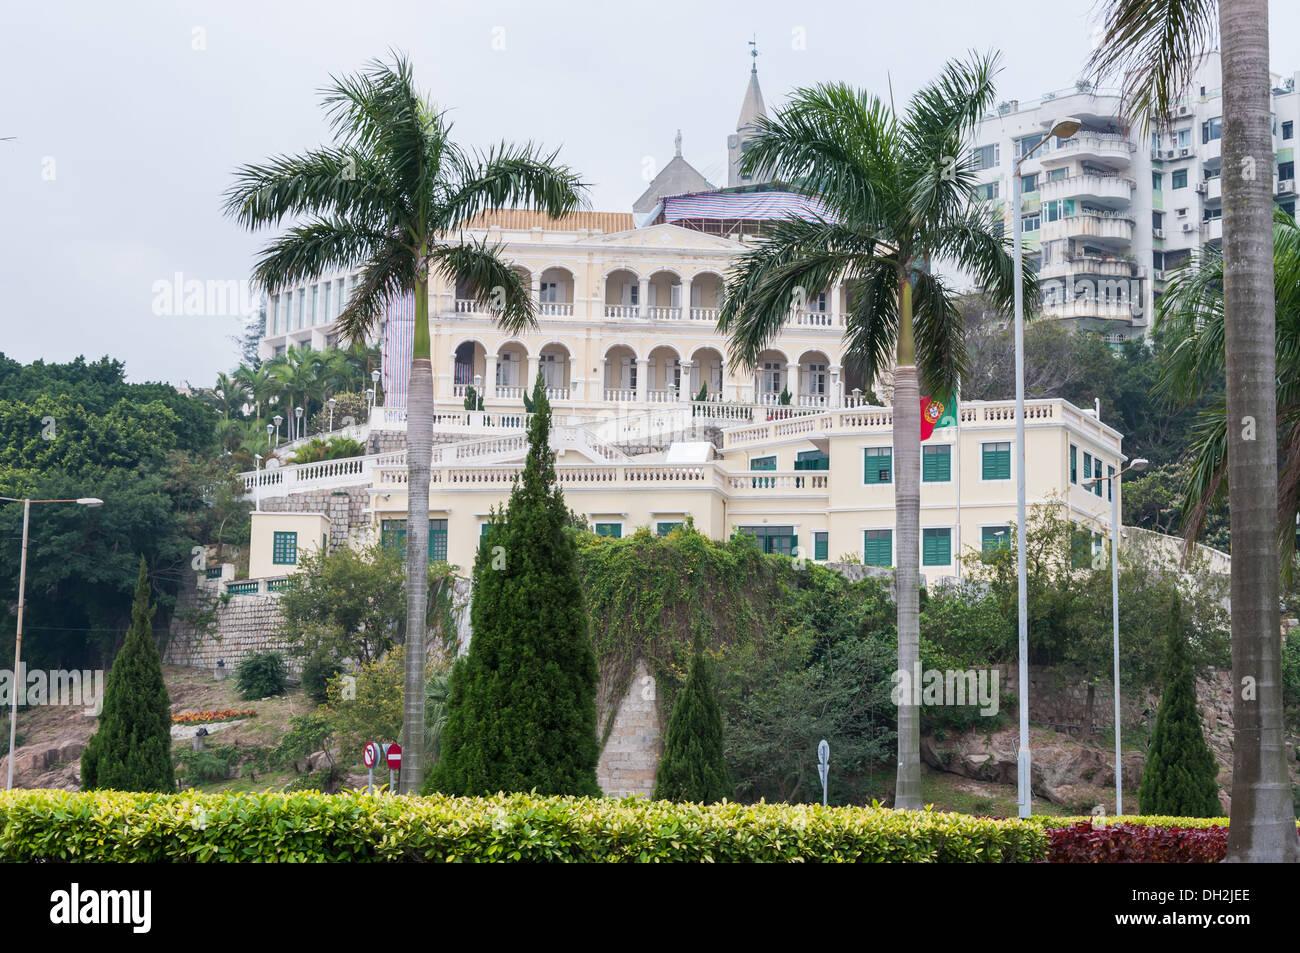 Arquitectura portuguesa en Macao, China. Imagen De Stock